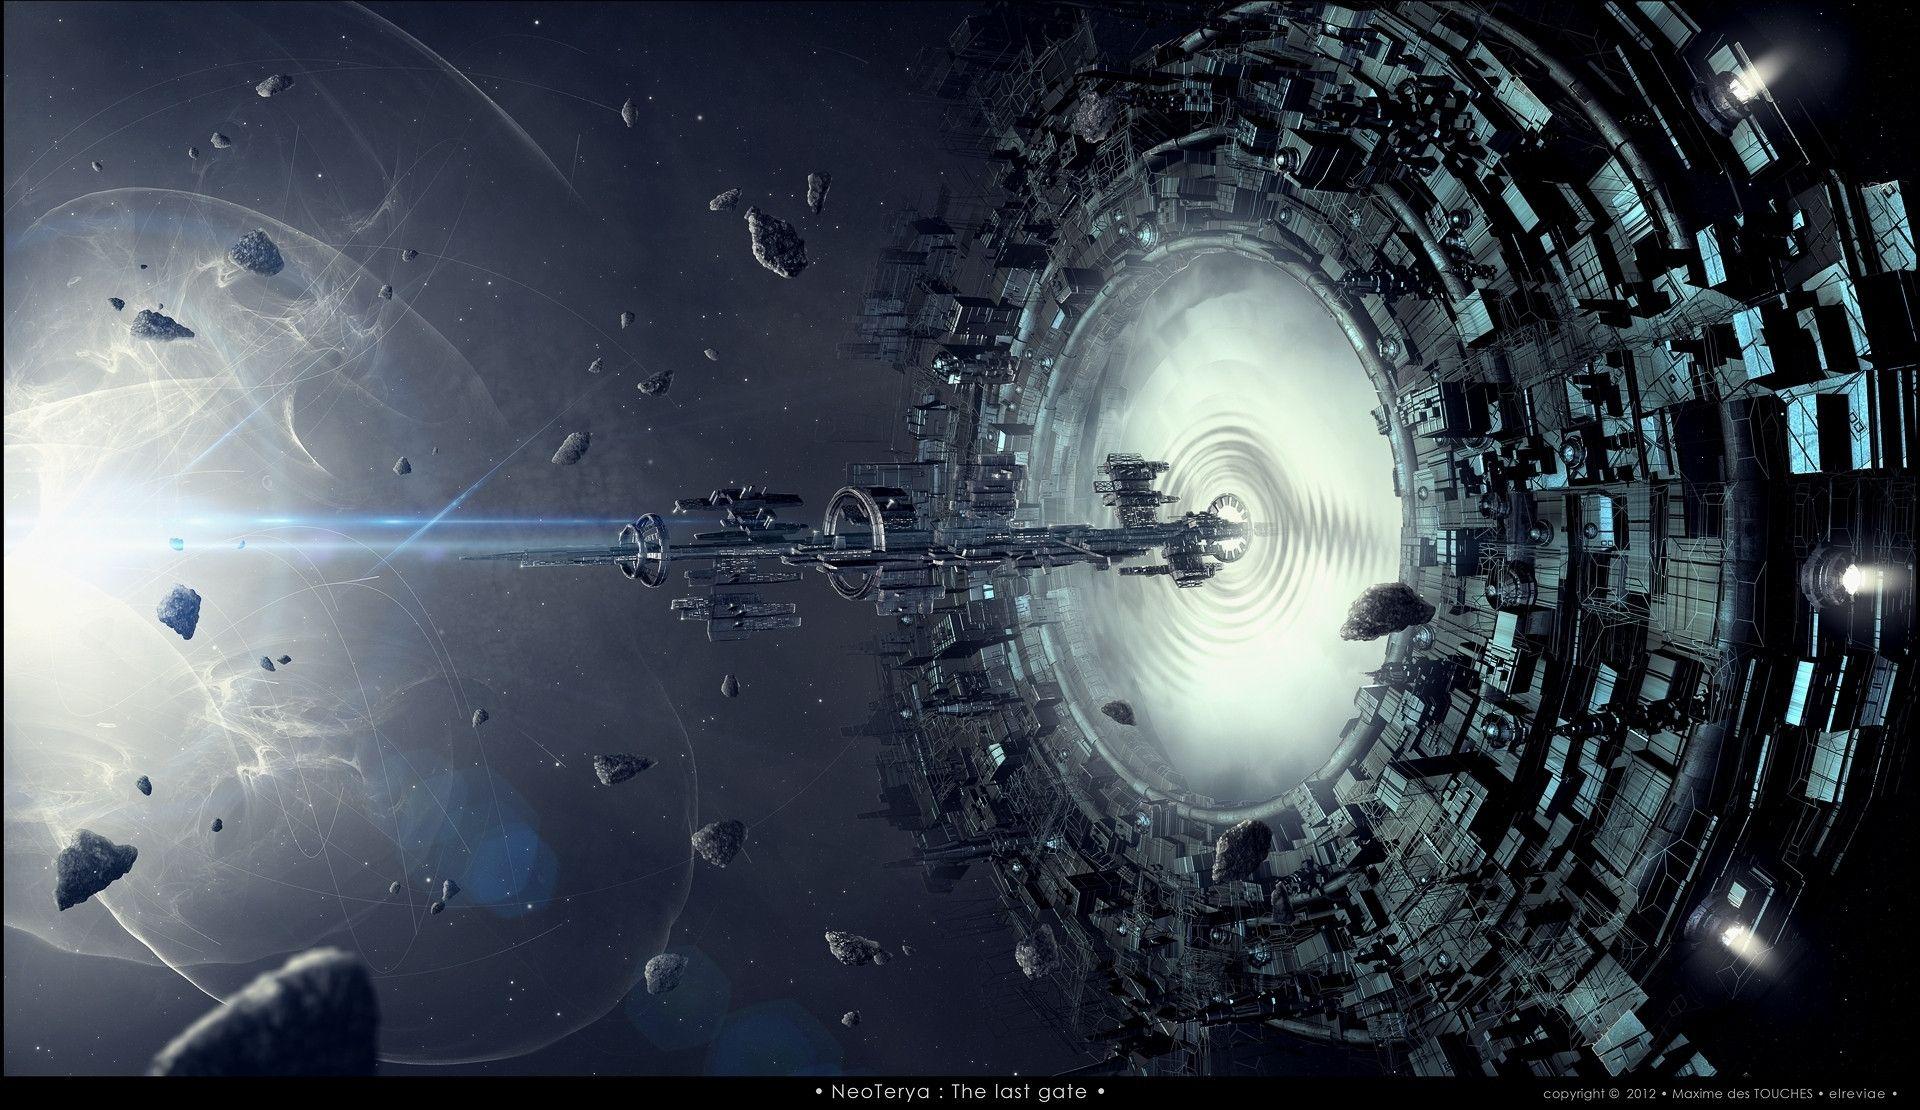 Sci Fi Wallpaper Post Space Art Science Fiction Artwork Concept Art